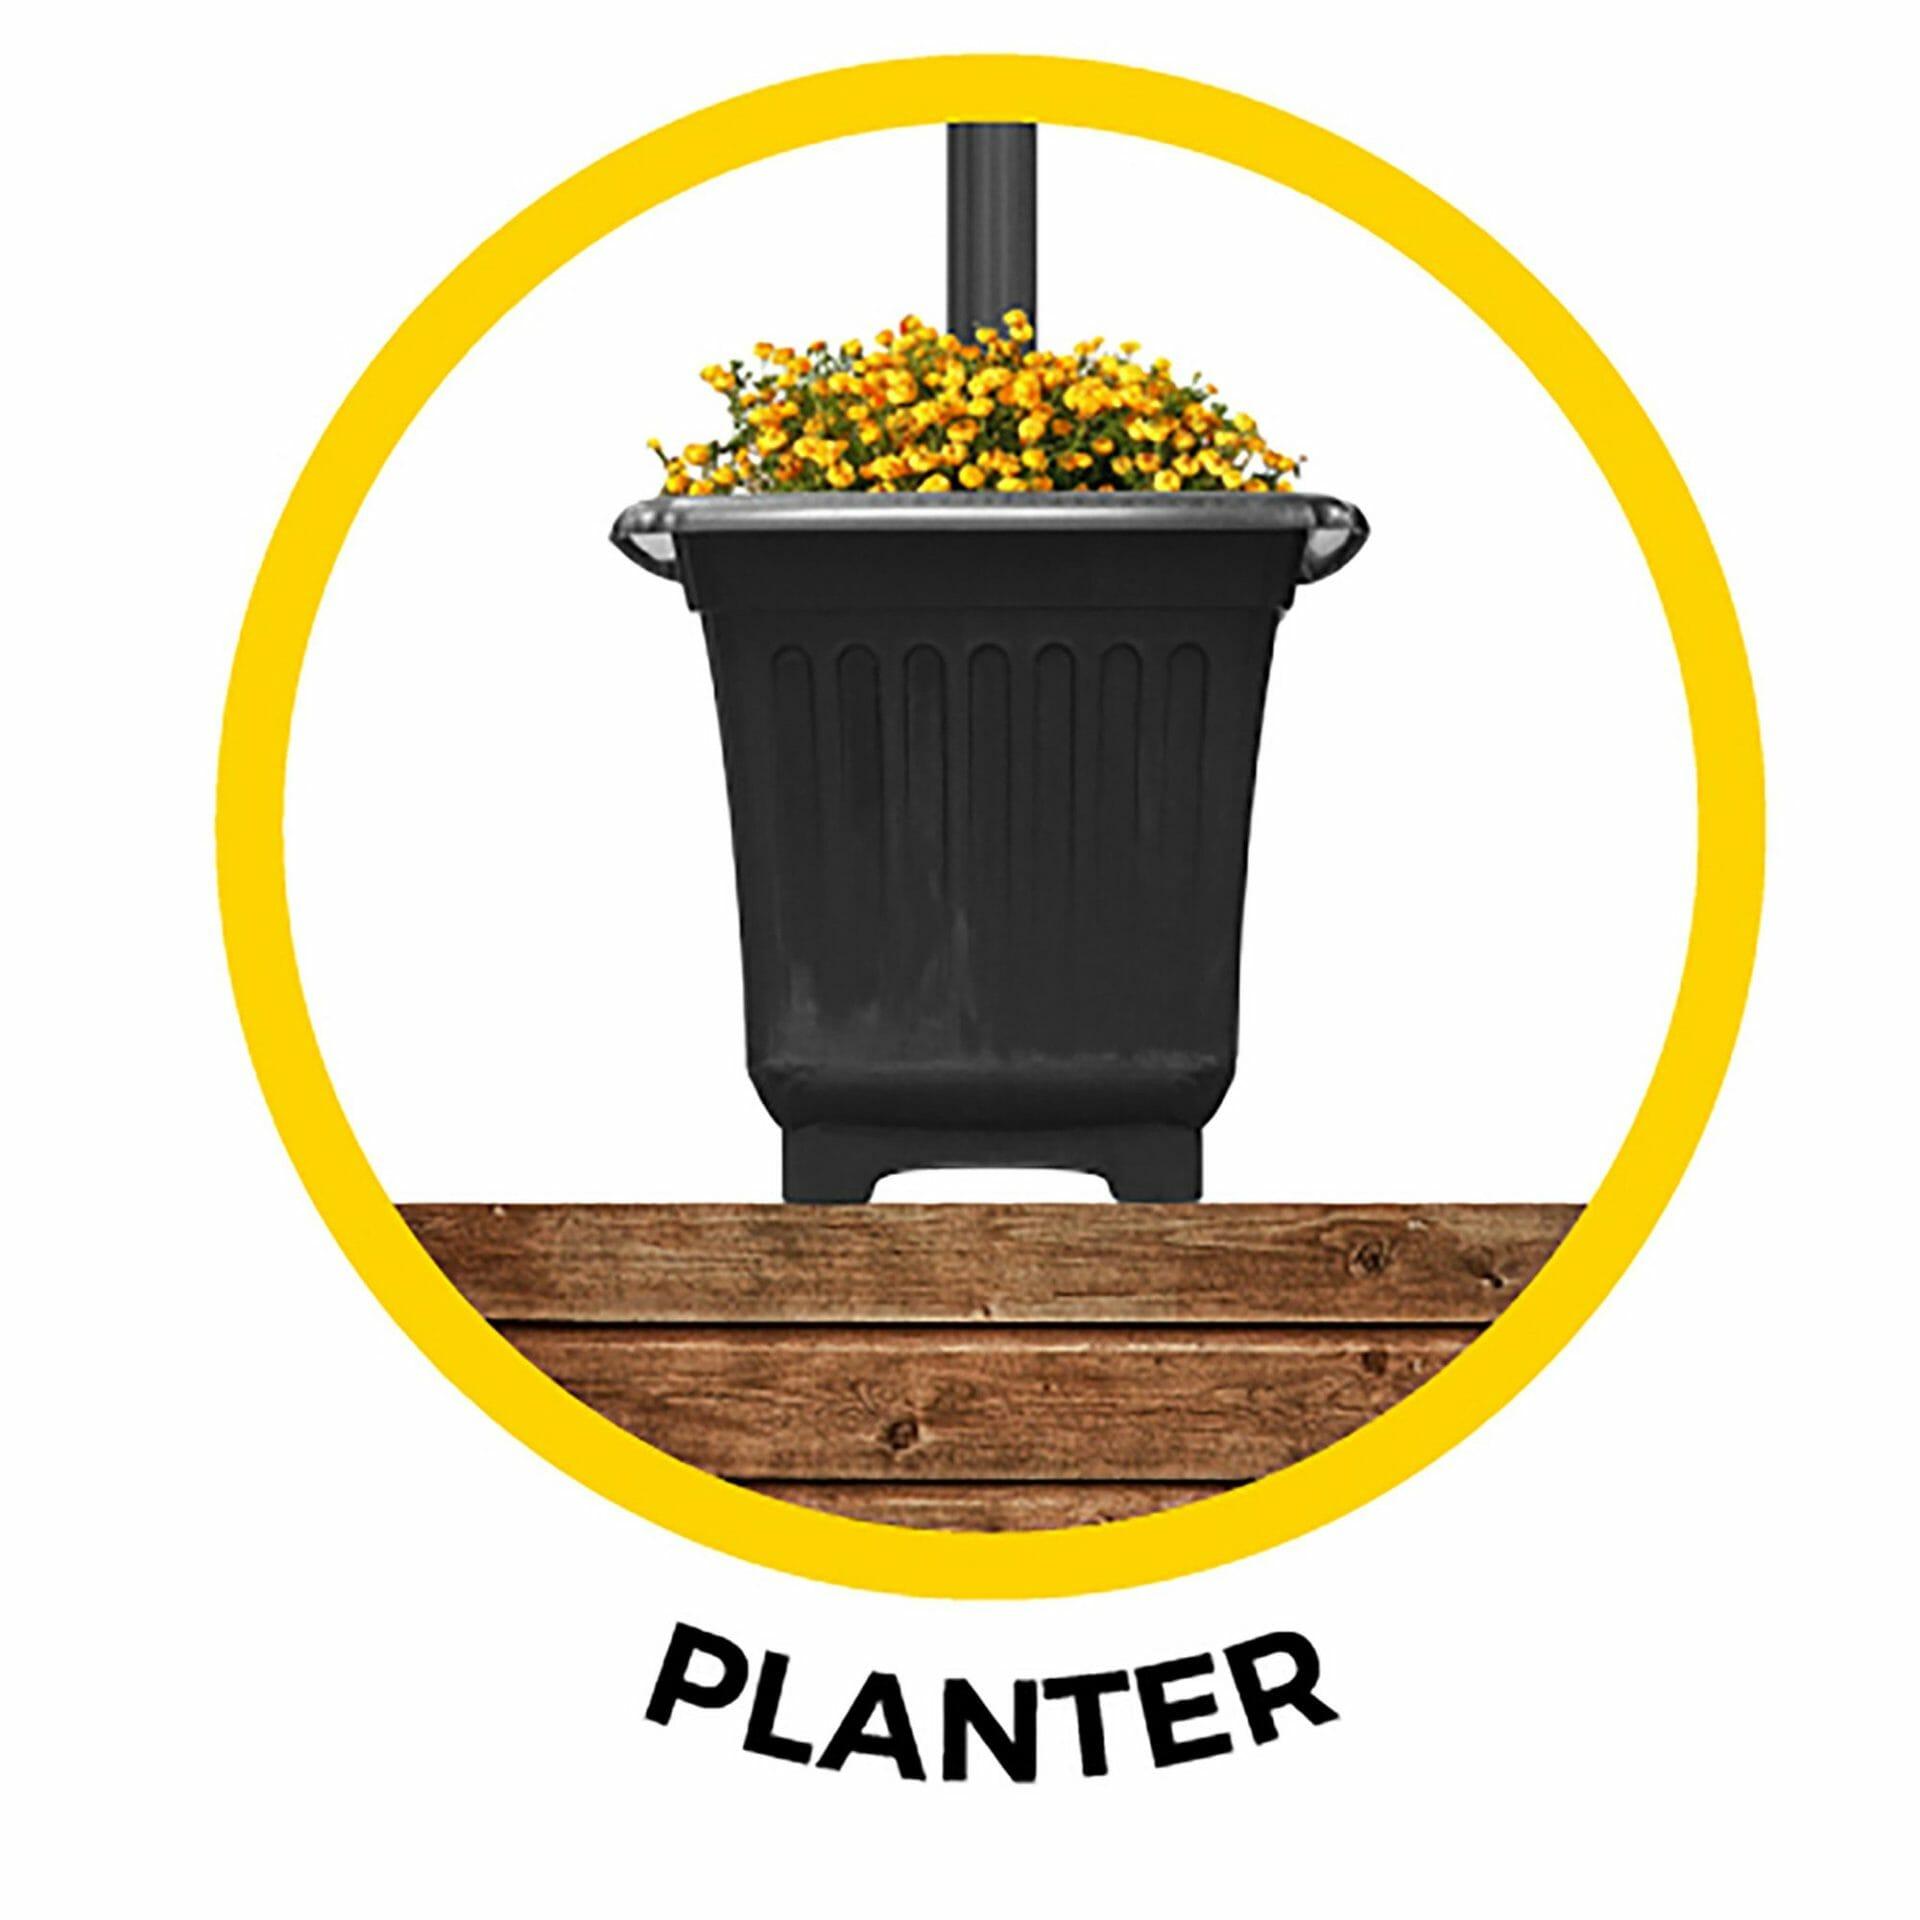 Planter for GS-105 Series 105PL880